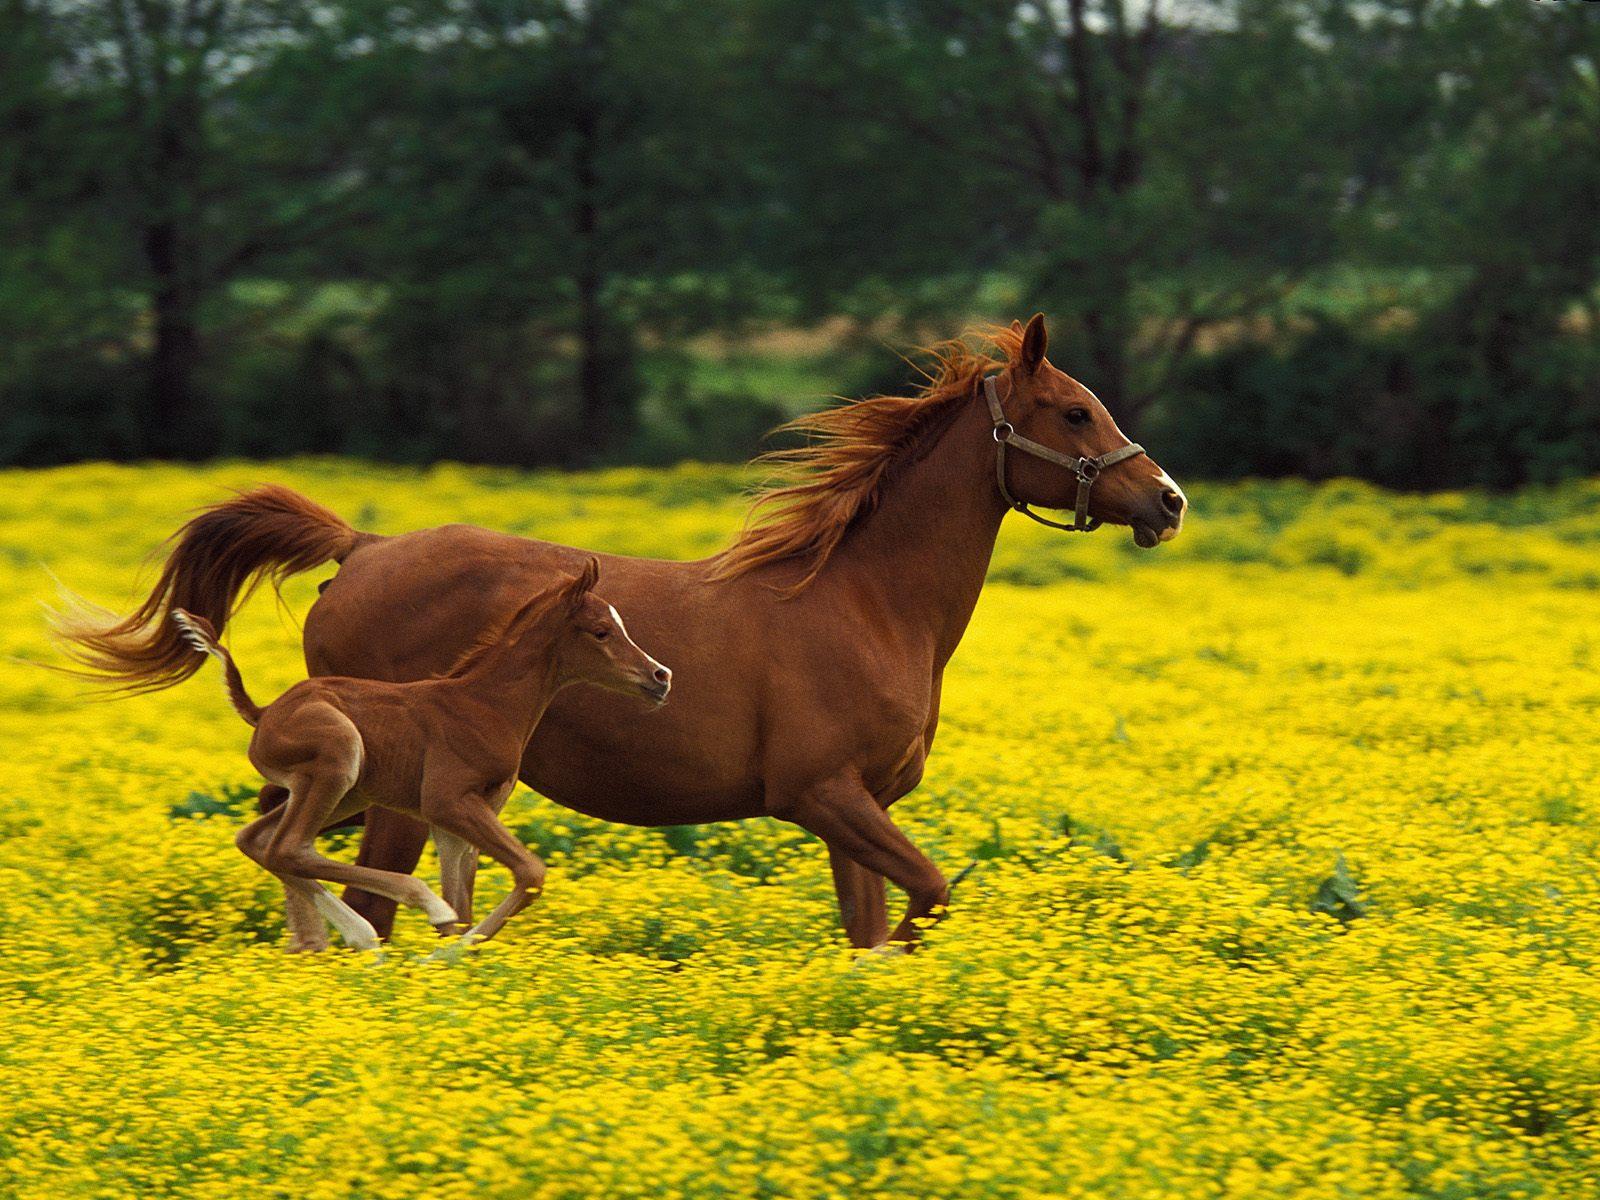 http://3.bp.blogspot.com/-yKYUTlrHNMg/TaP9SSFTEhI/AAAAAAAAAZY/Rx6w7AAyAqk/s1600/Arabian+Mare+and+Foal%252C+Louisville%252C+Kentucky.jpg